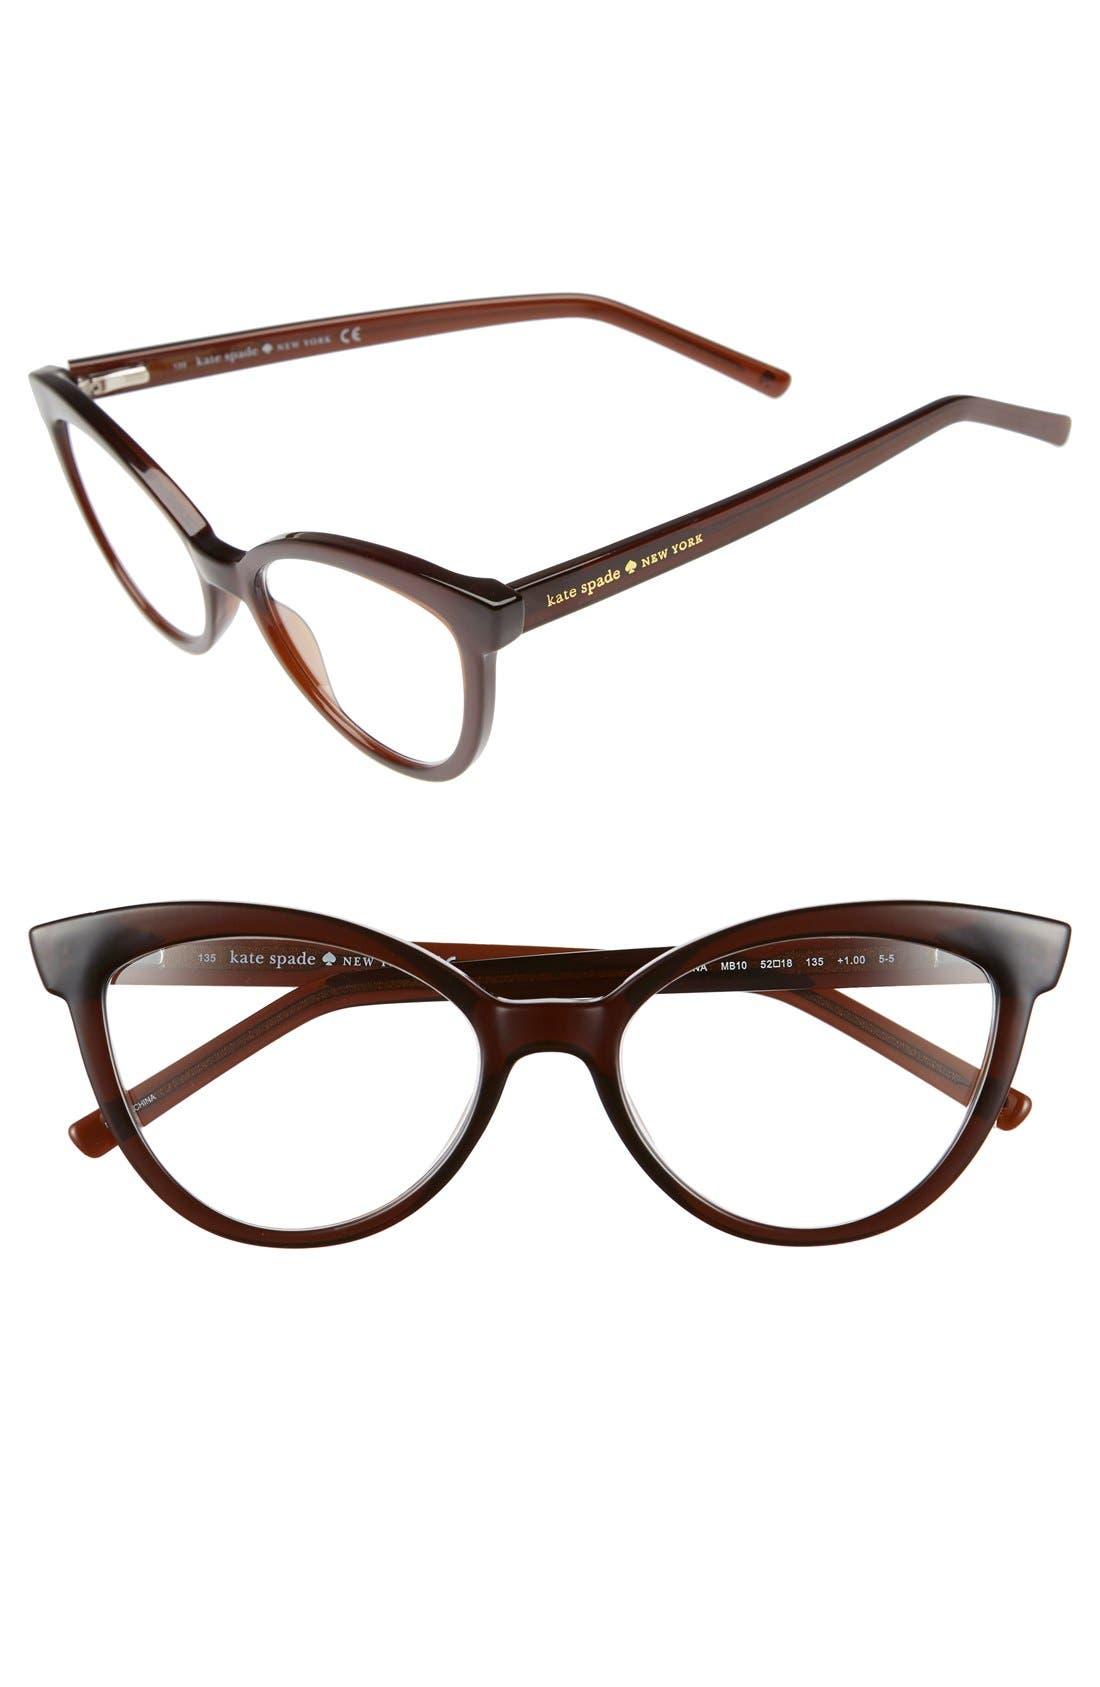 Alternate Image 1 Selected - kate spade new york 'danna' 52mm cat eye reading glasses